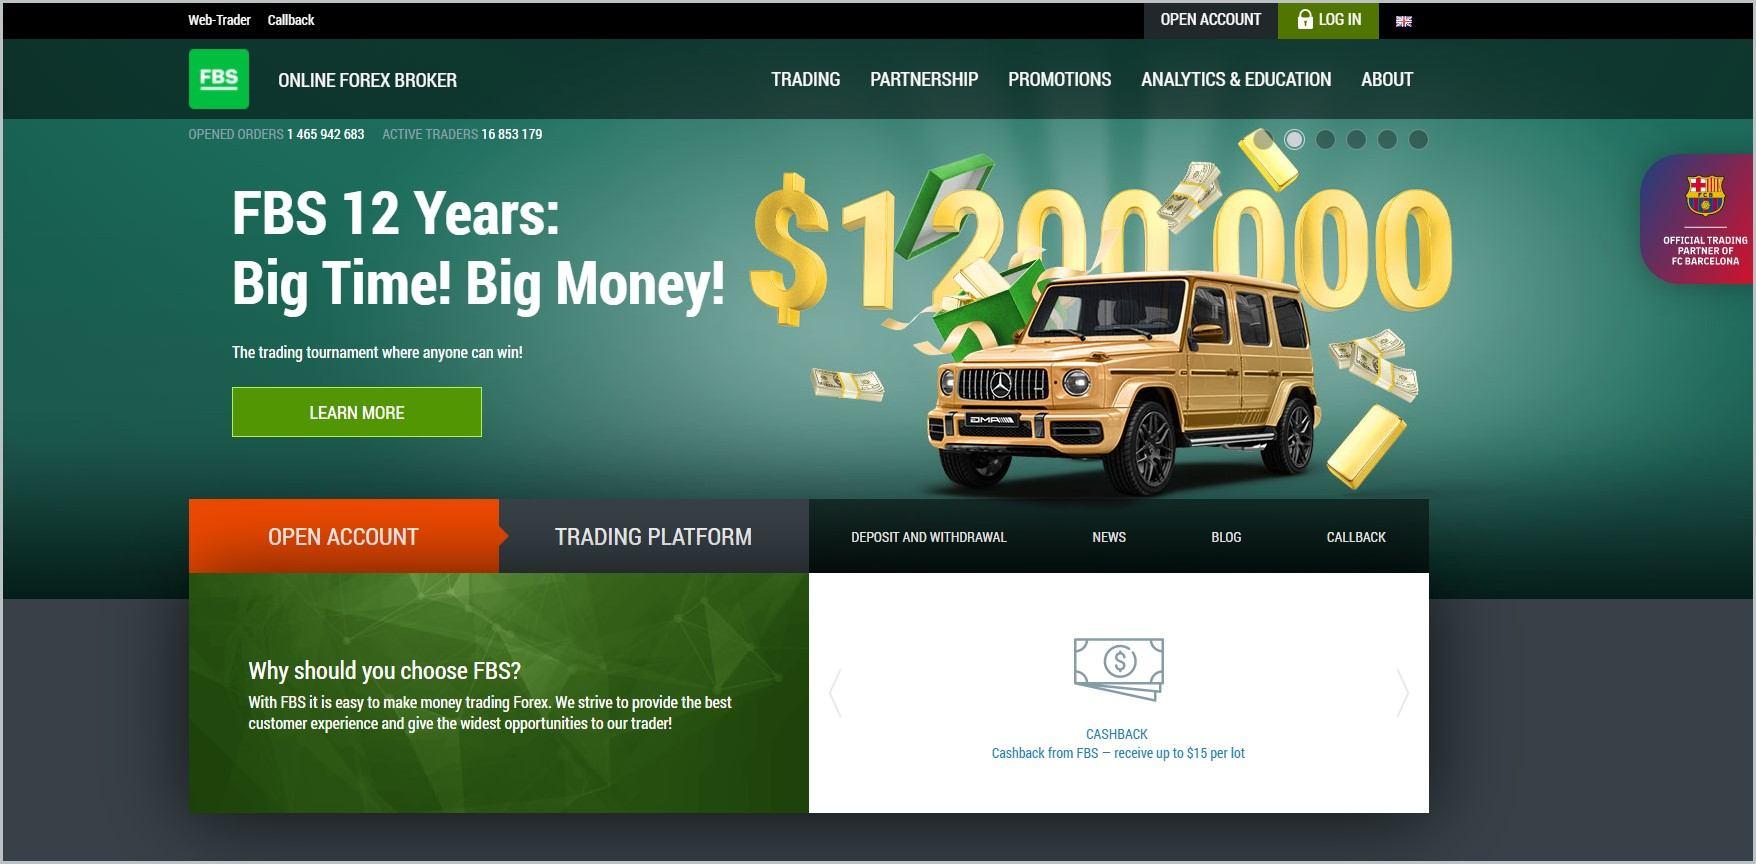 screenshot of FBS homepage, with black header bearing the website's name and main navigation menu